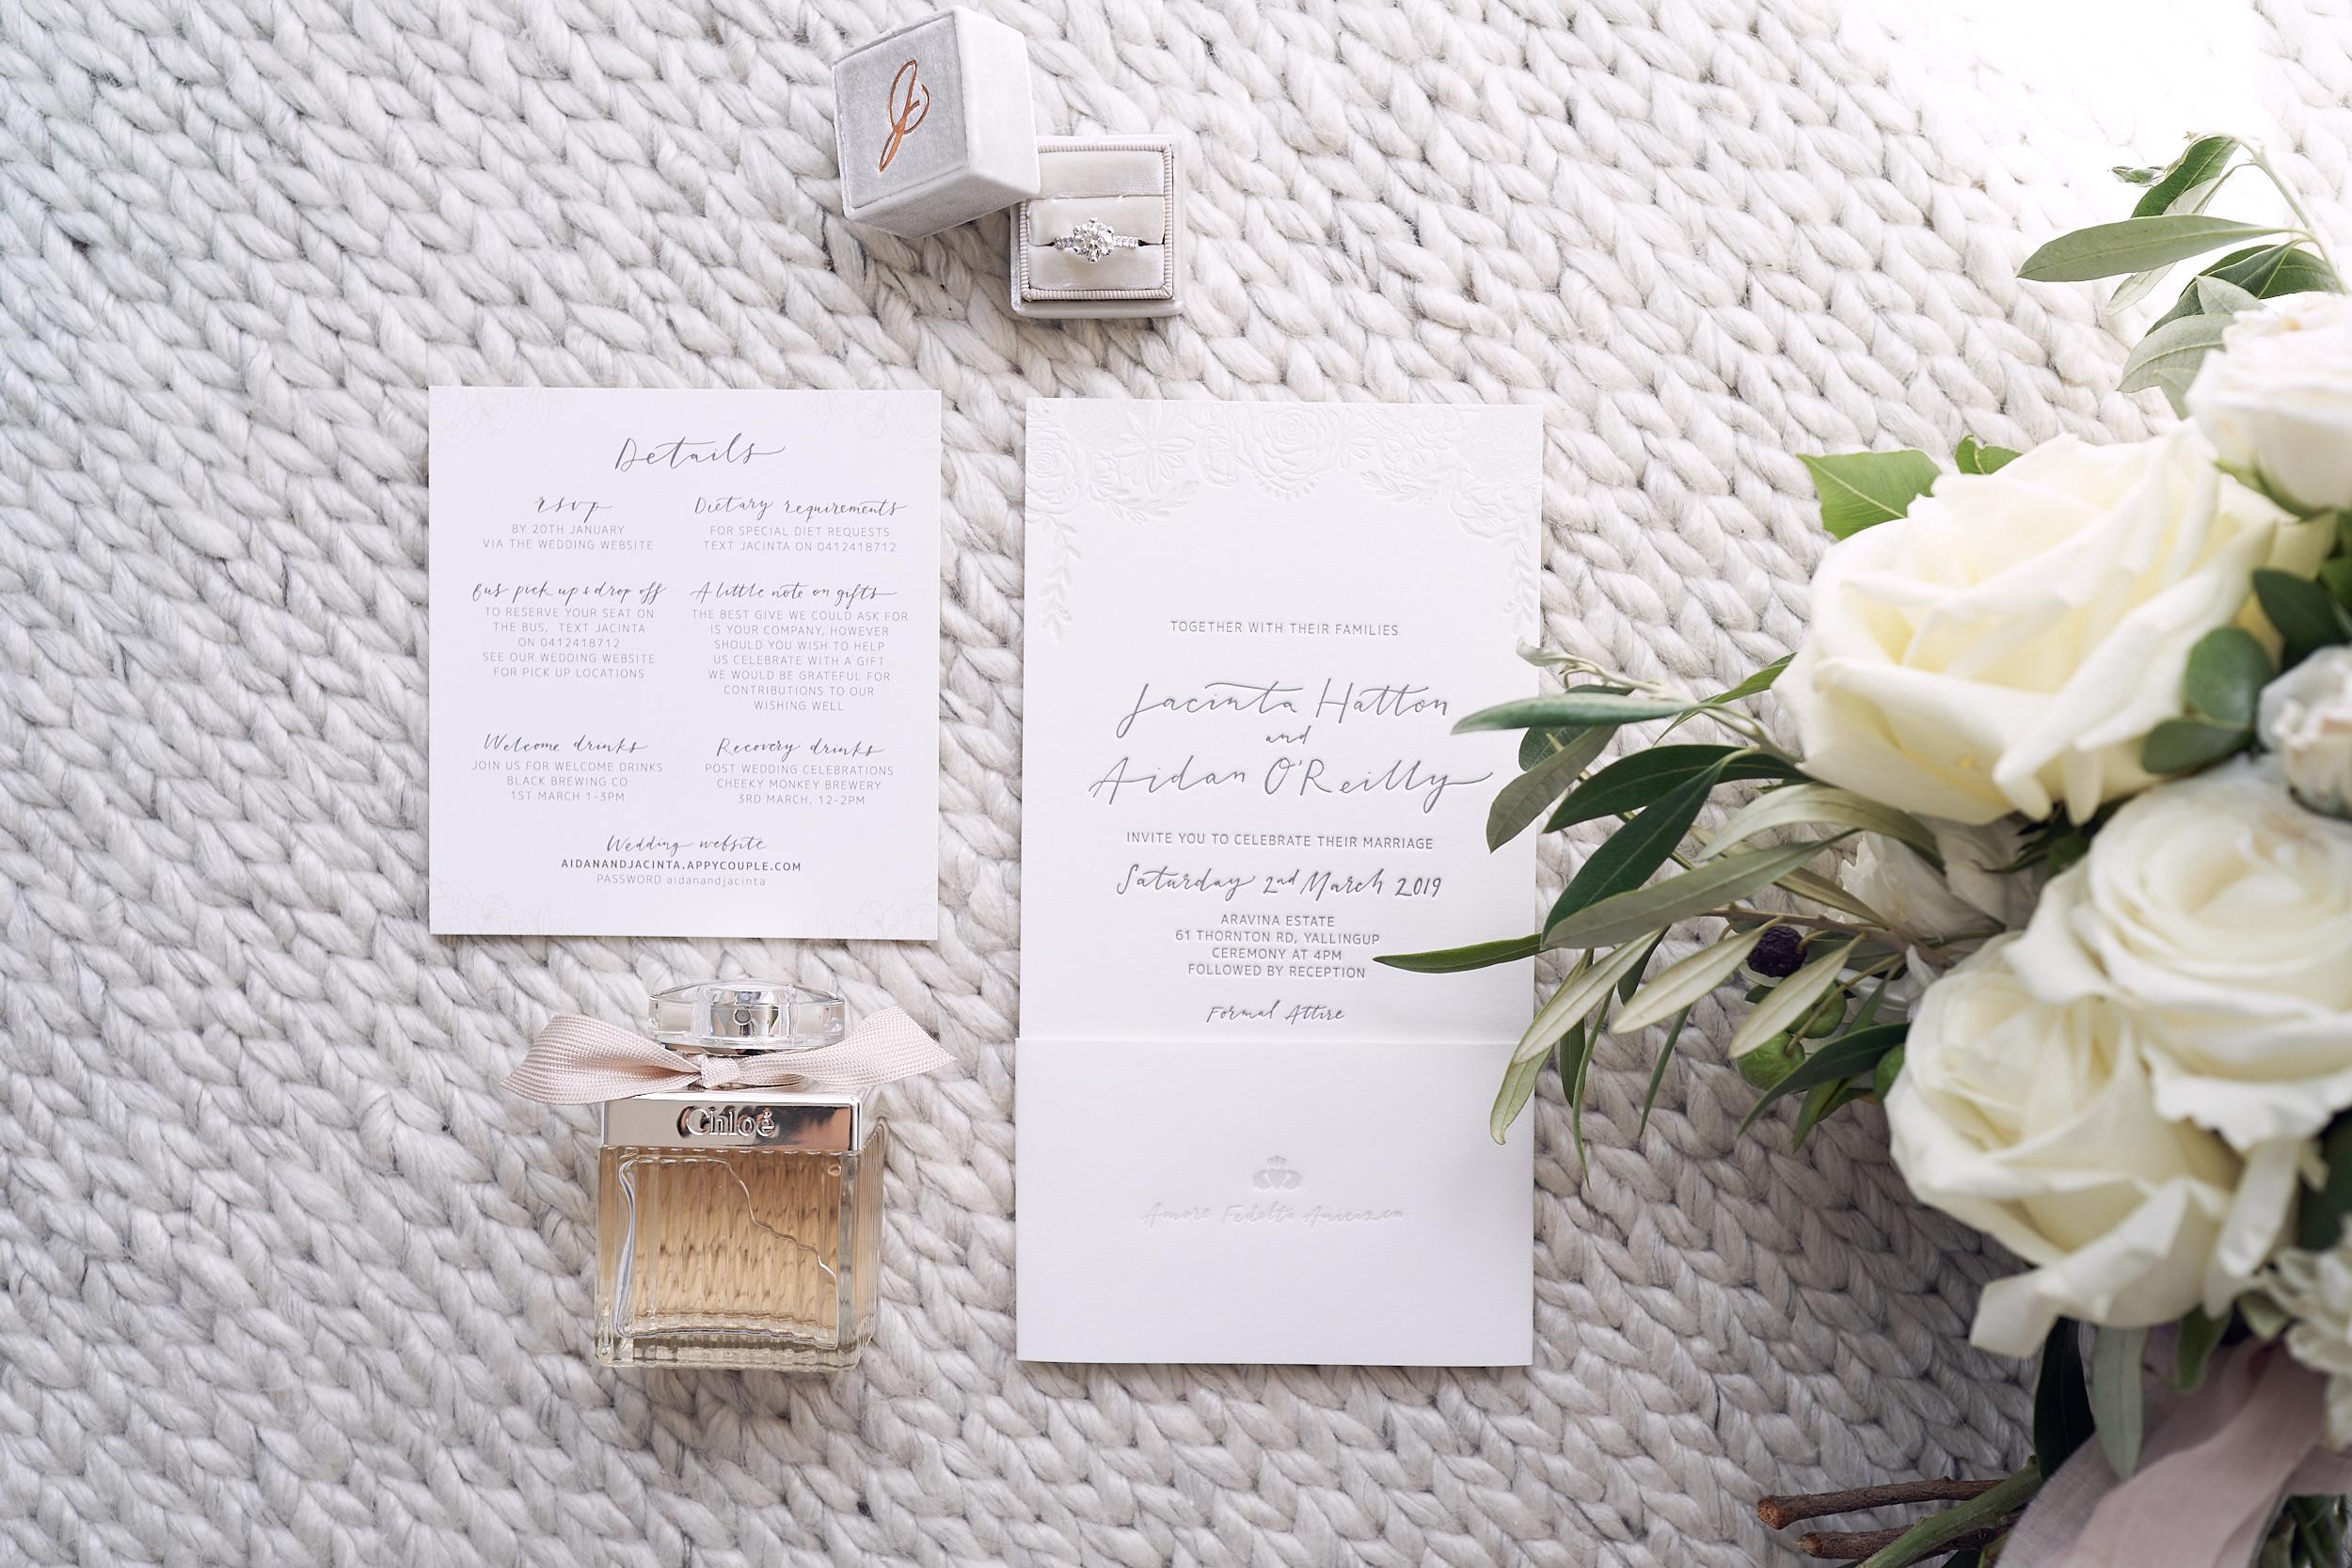 LR_JandA-aravina-wedding-LostInLove 137.jpg